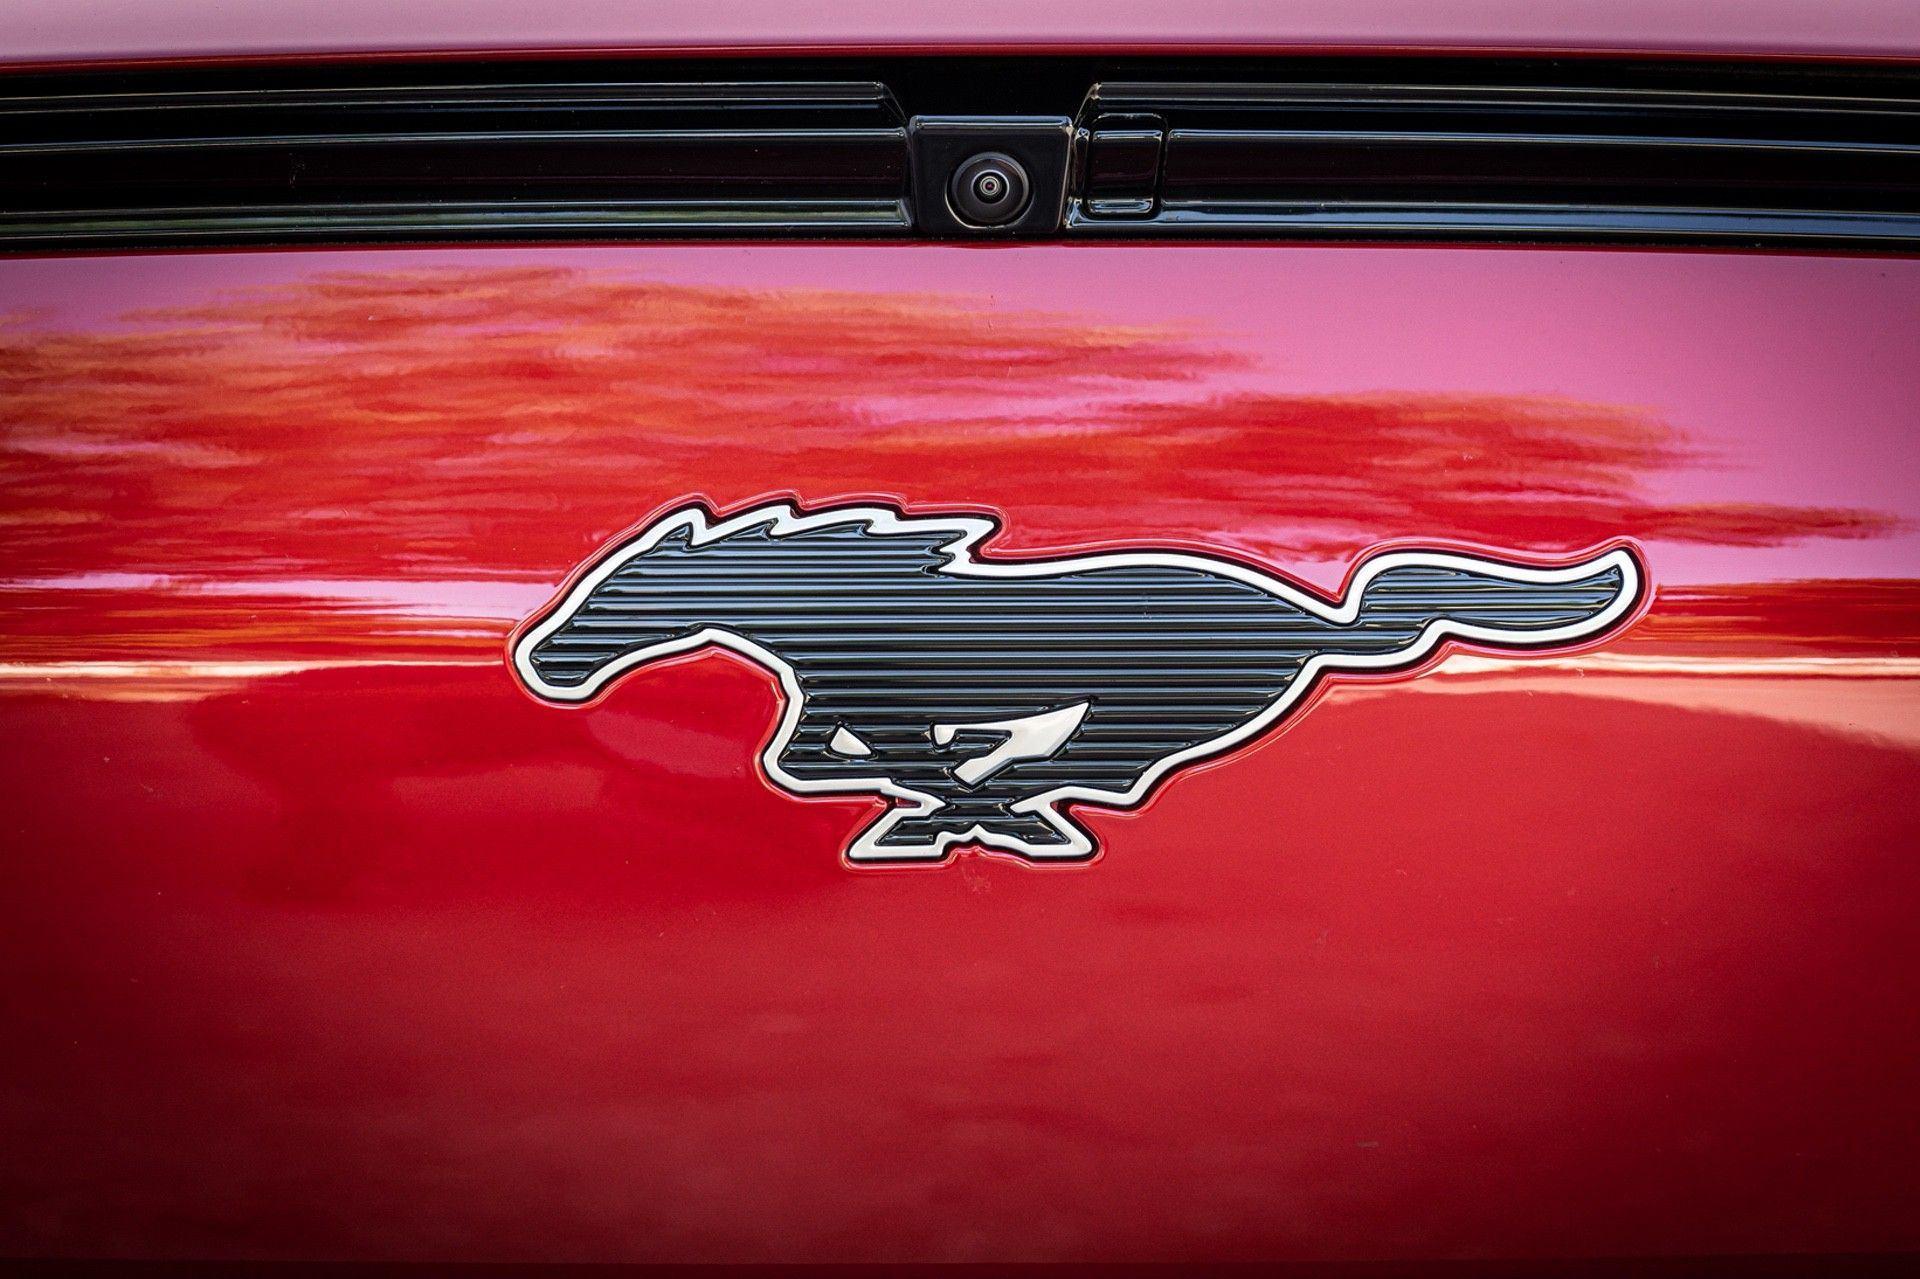 Ford_Mustang_Mach-E_greek_presskit-0165